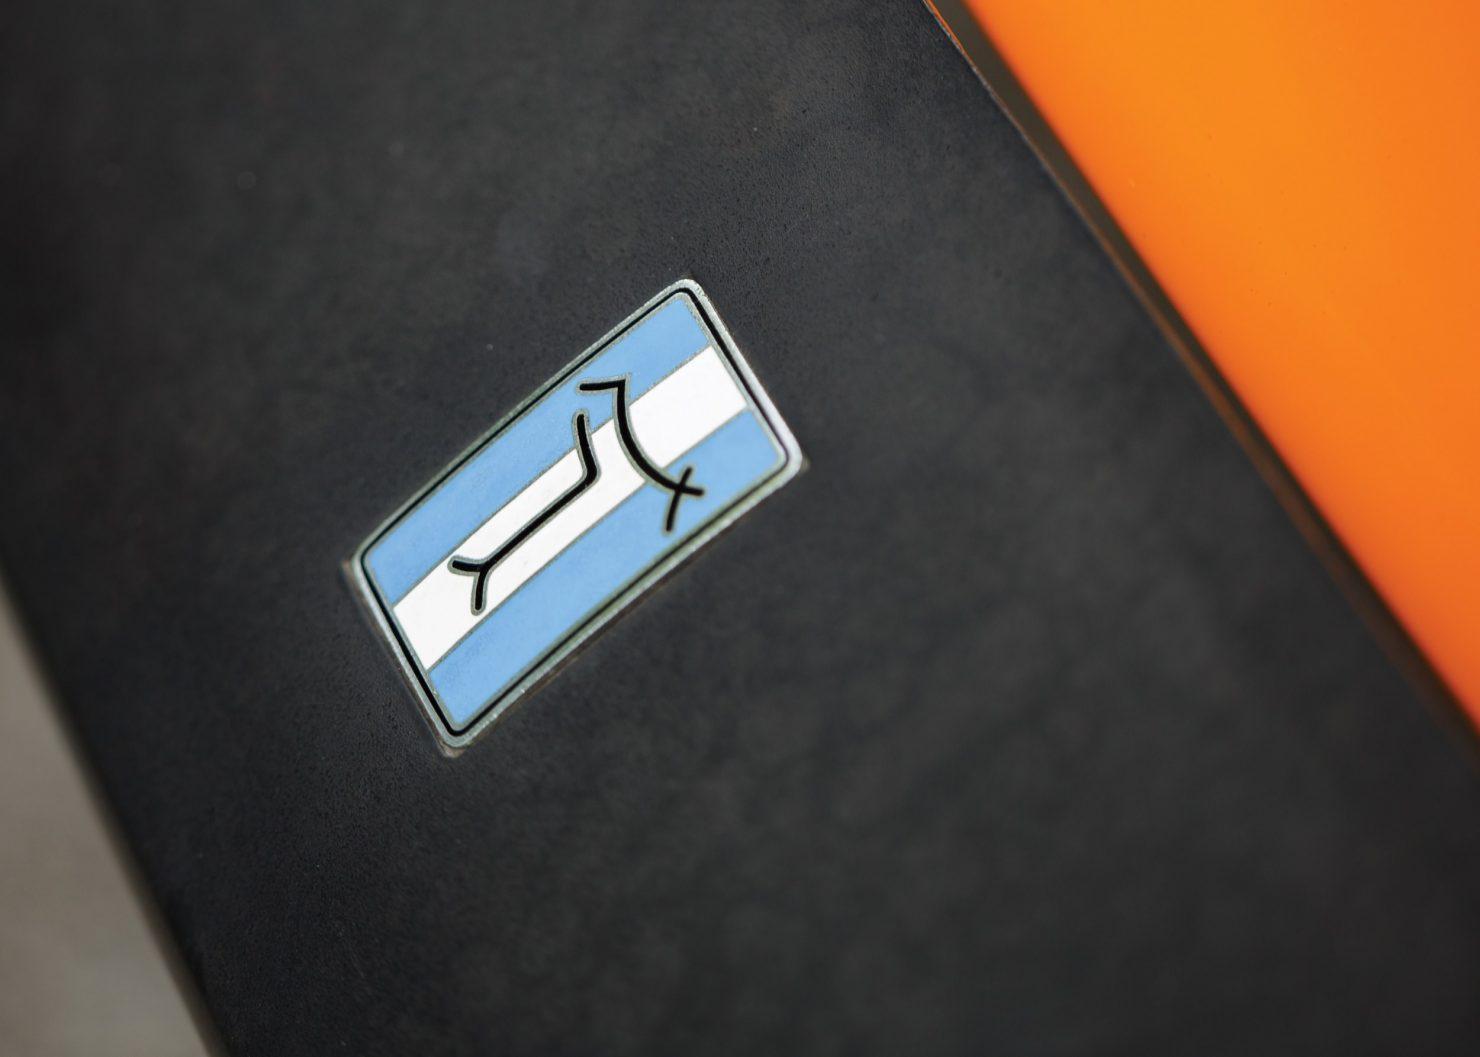 de tomaso pantera 6 1480x1057 - The Last American De Tomaso Pantera